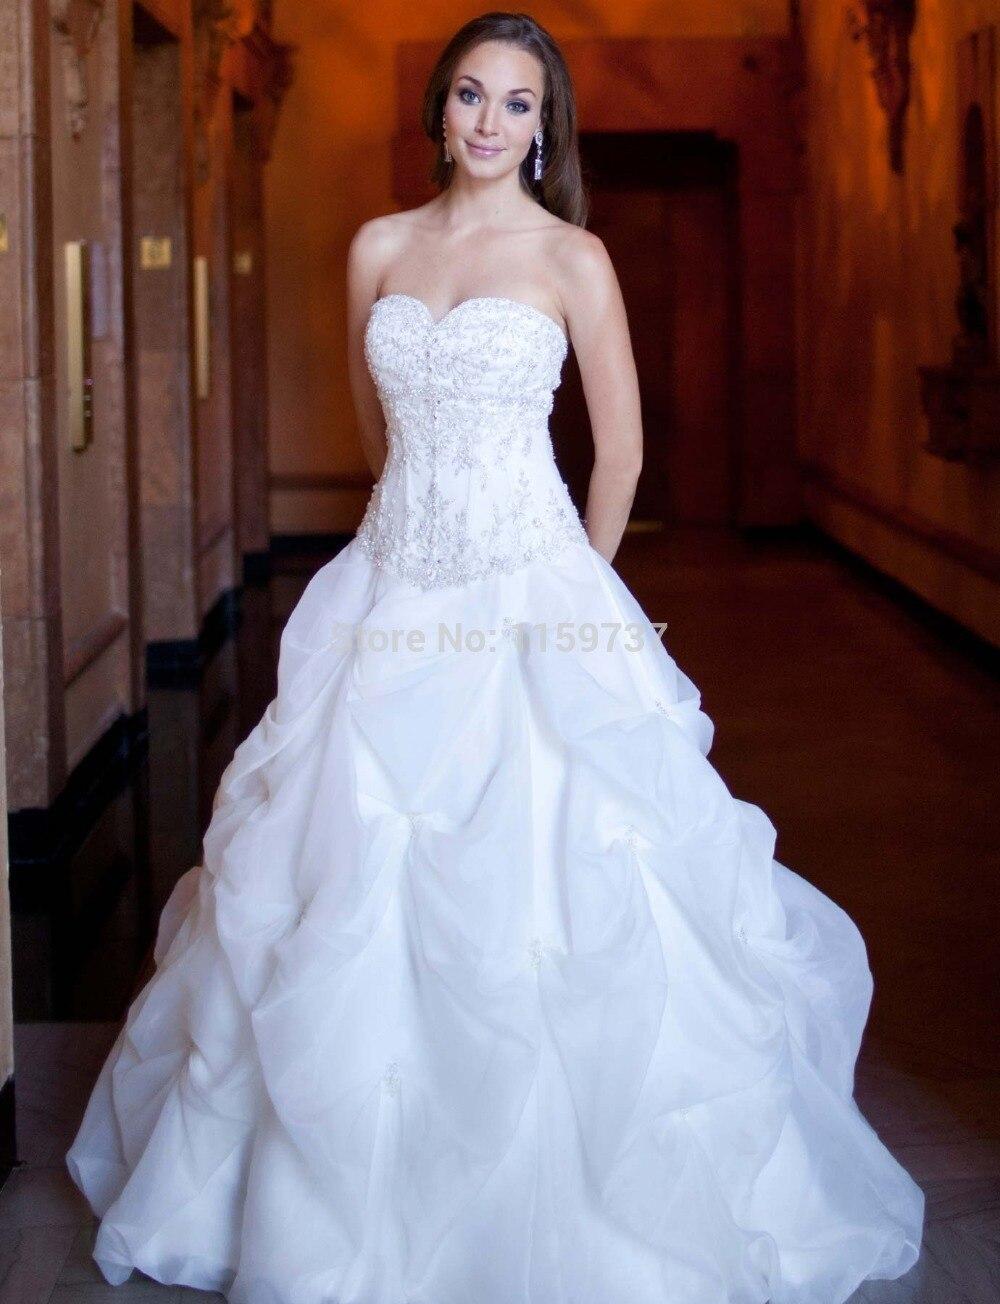 Sue Wong Wedding Dresses Short Cheap Hire A Dress Lace Ball Gown ...